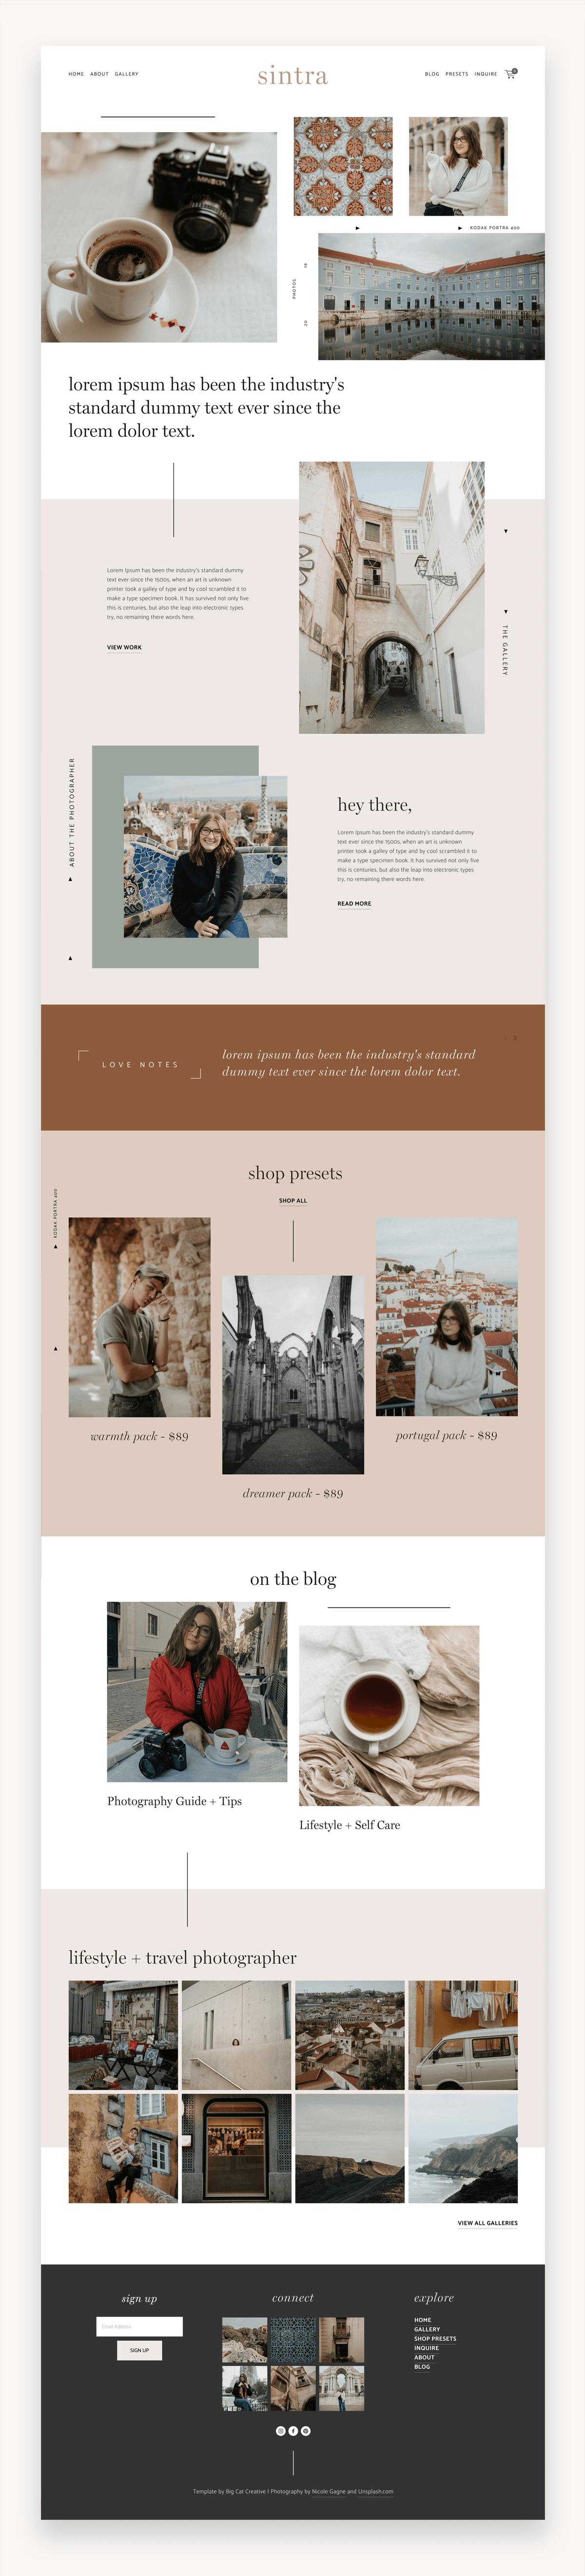 Sintra Squarespace Template - Fullscreen